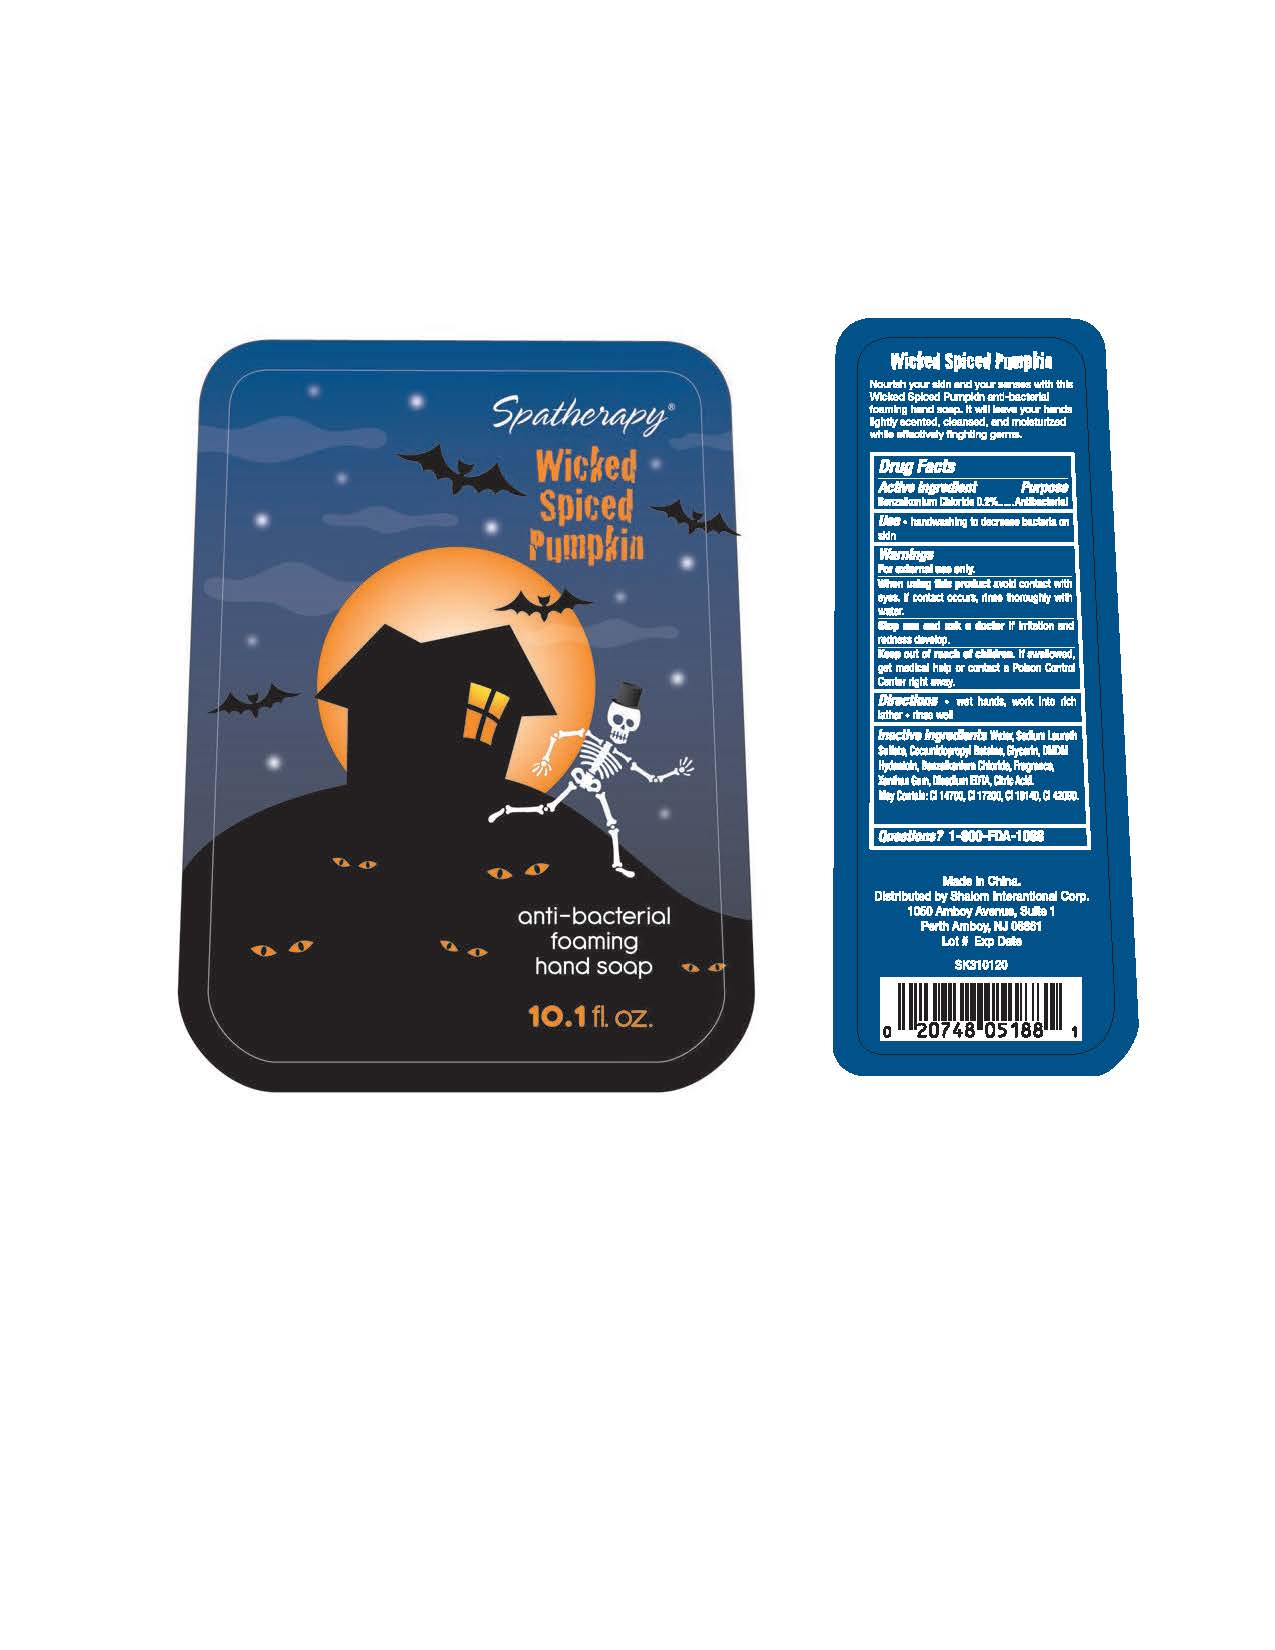 Spatherapy (Benzalkonium Chloride) Lotion [Xiamen Olivee Daily Use Chemical Co., Ltd.]